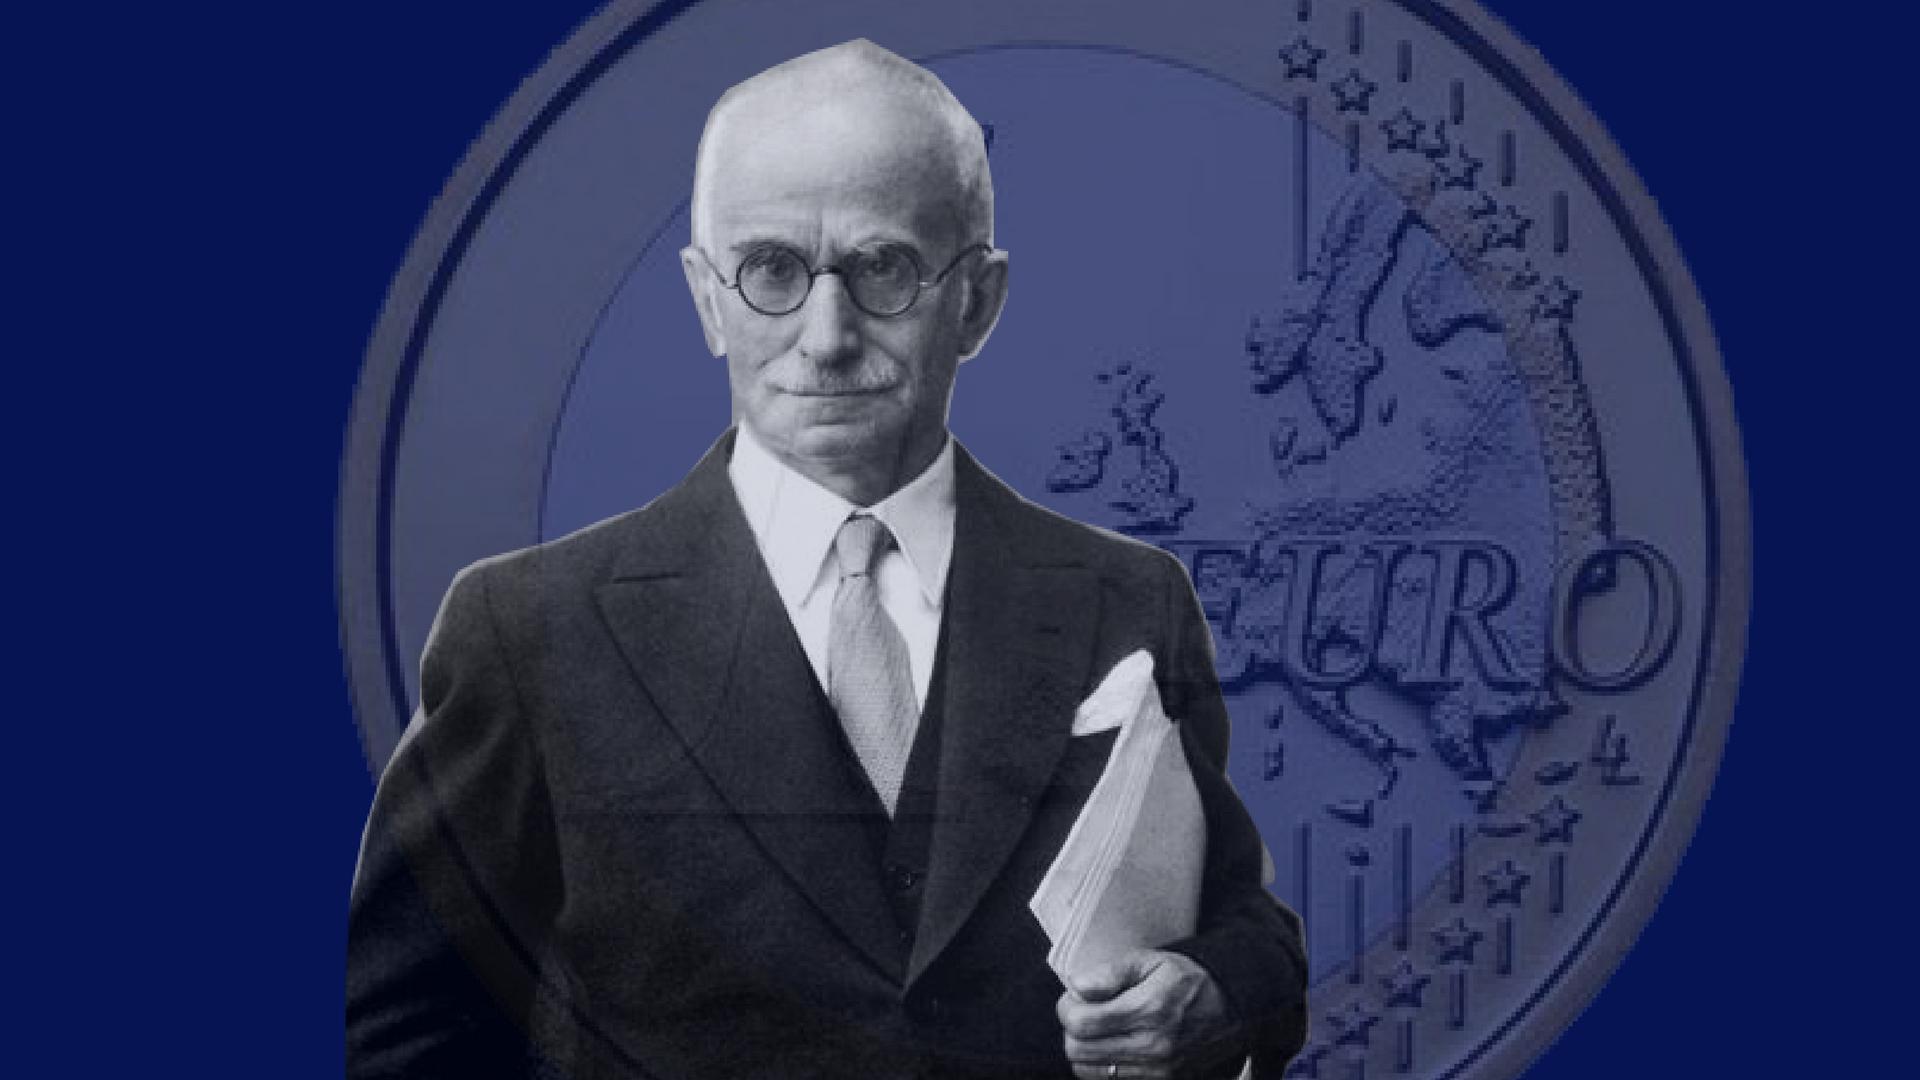 Uno straordinario Luigi Einaudi. Dedicato ai sovranisti, anti-euro, antieuropa